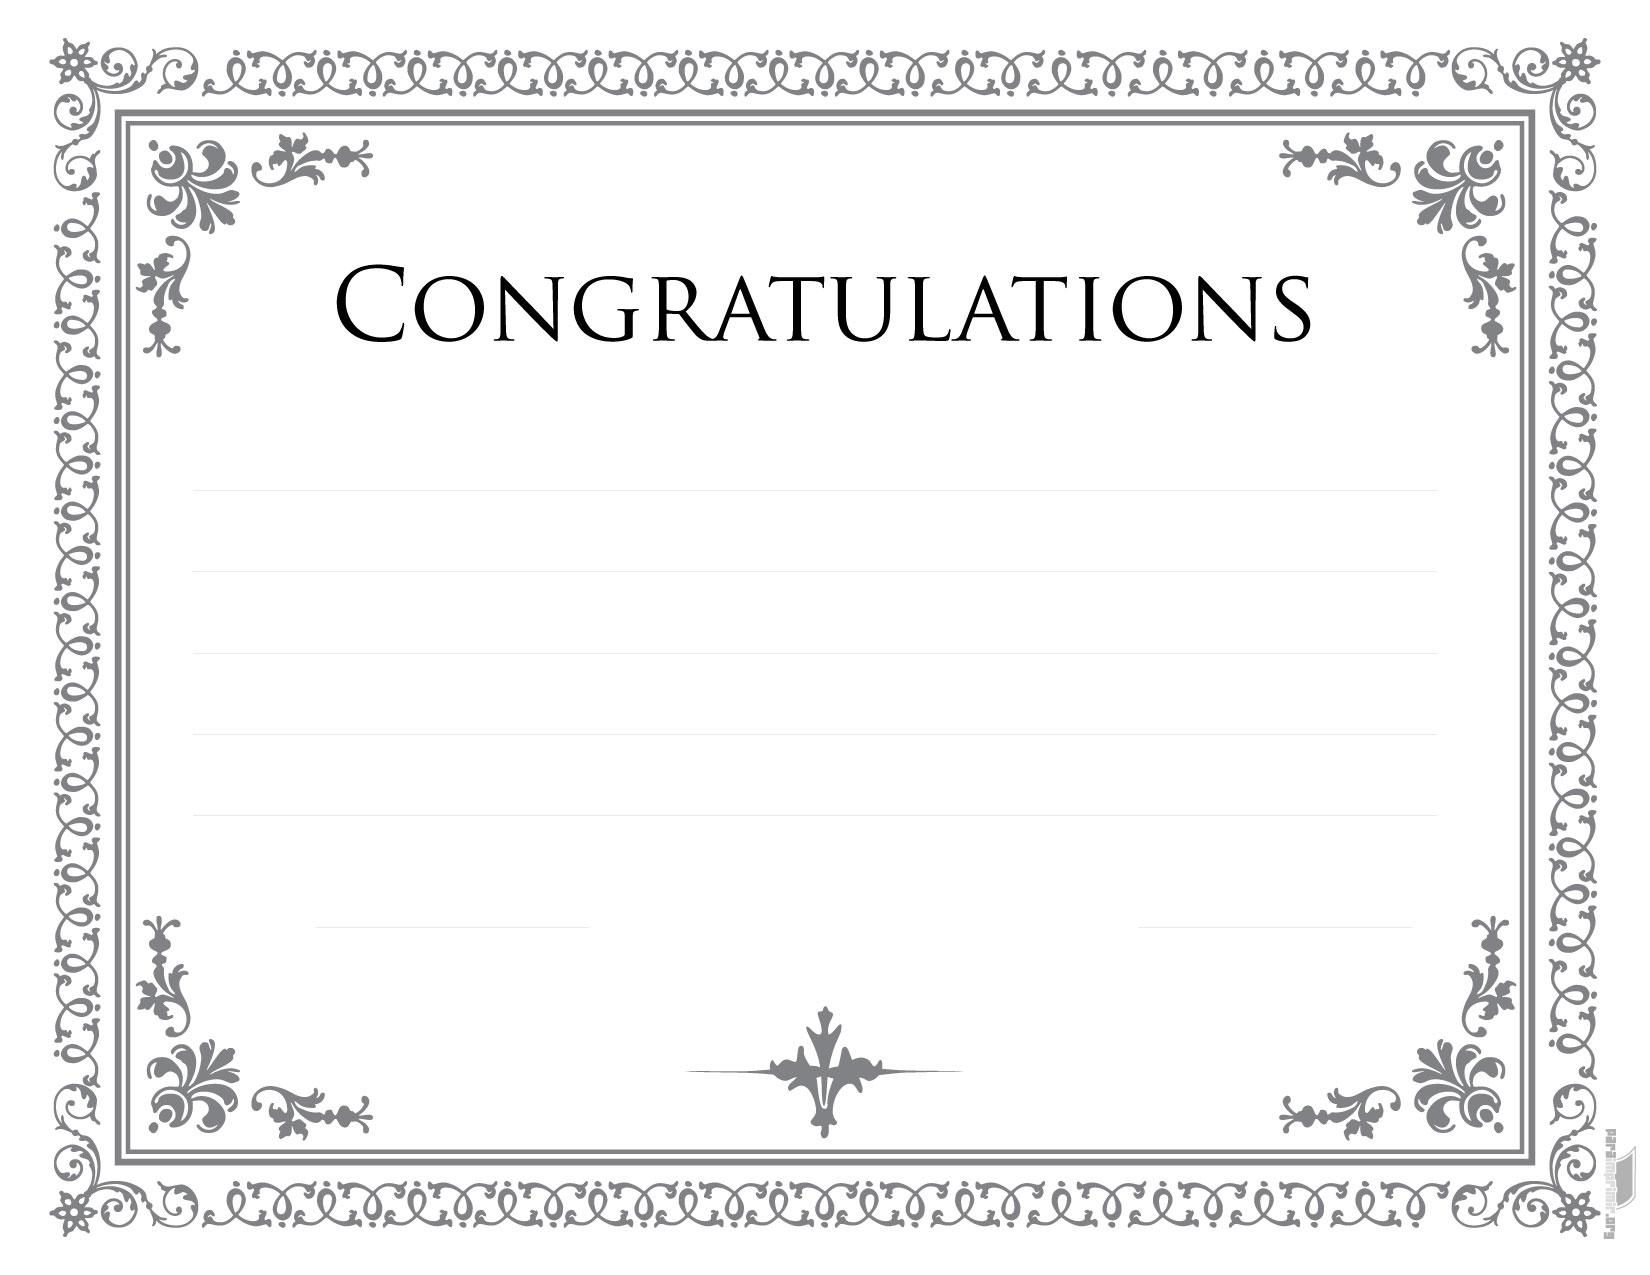 Descarga este diploma de congratulations para imprimir en PDF